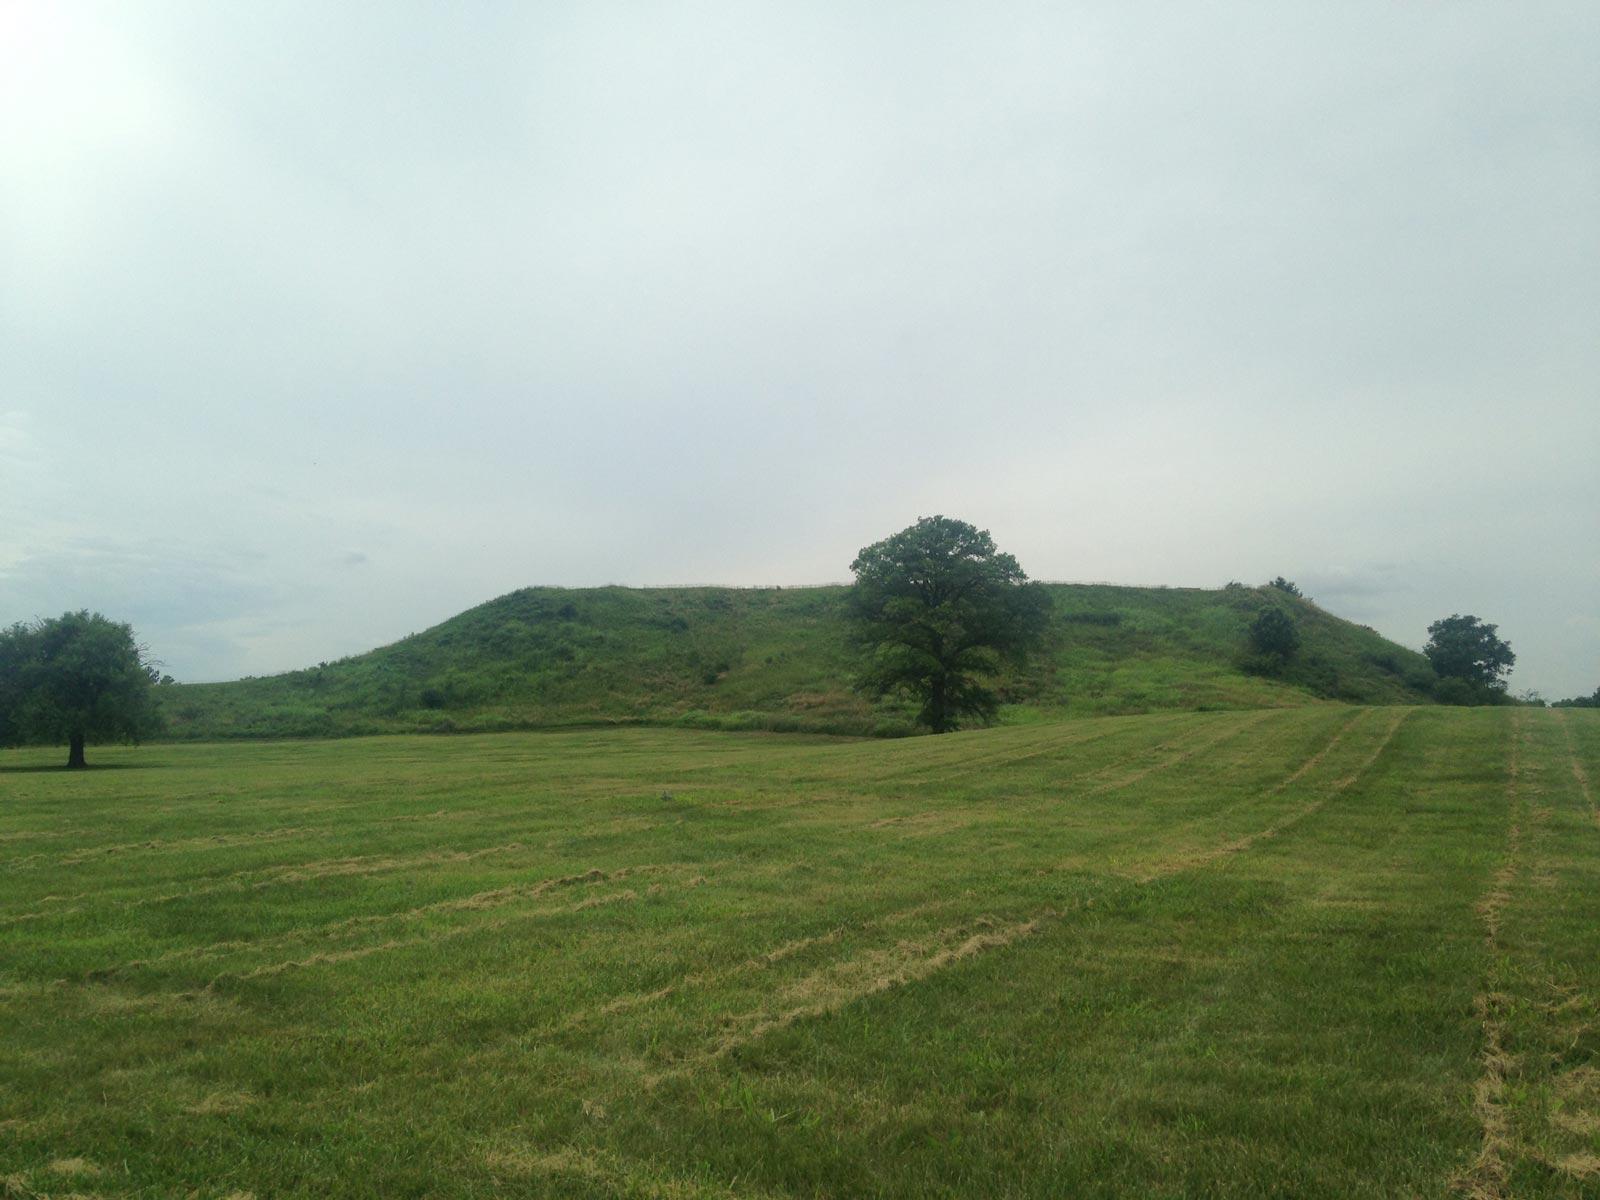 Cahokia Mounds State Historic Site, Collinsville, Illinois